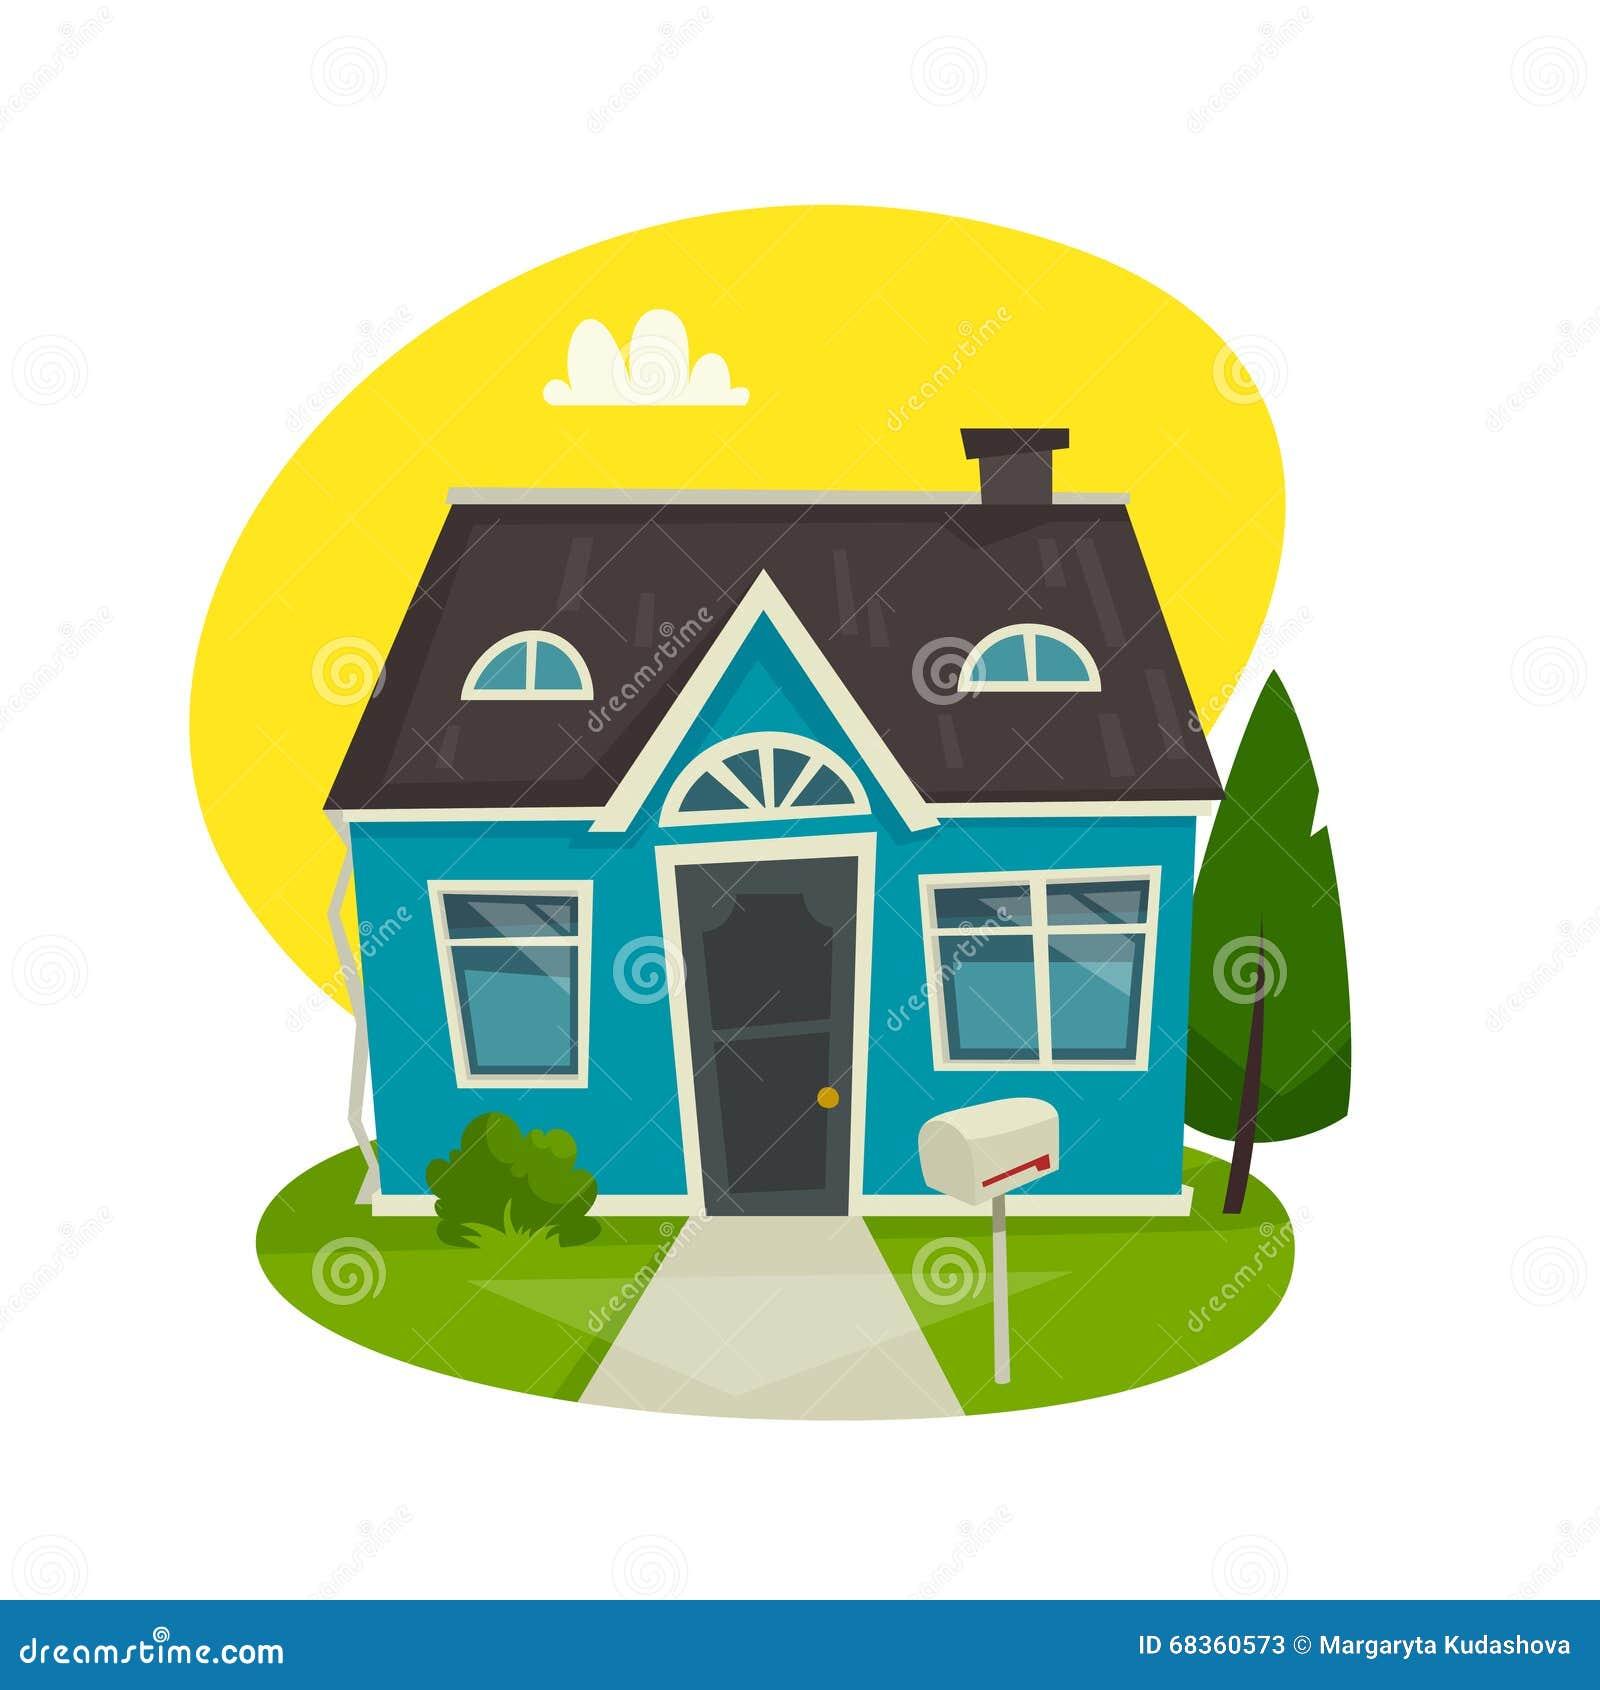 House Building Concept, Cottage Exterior, Cartoon Vector